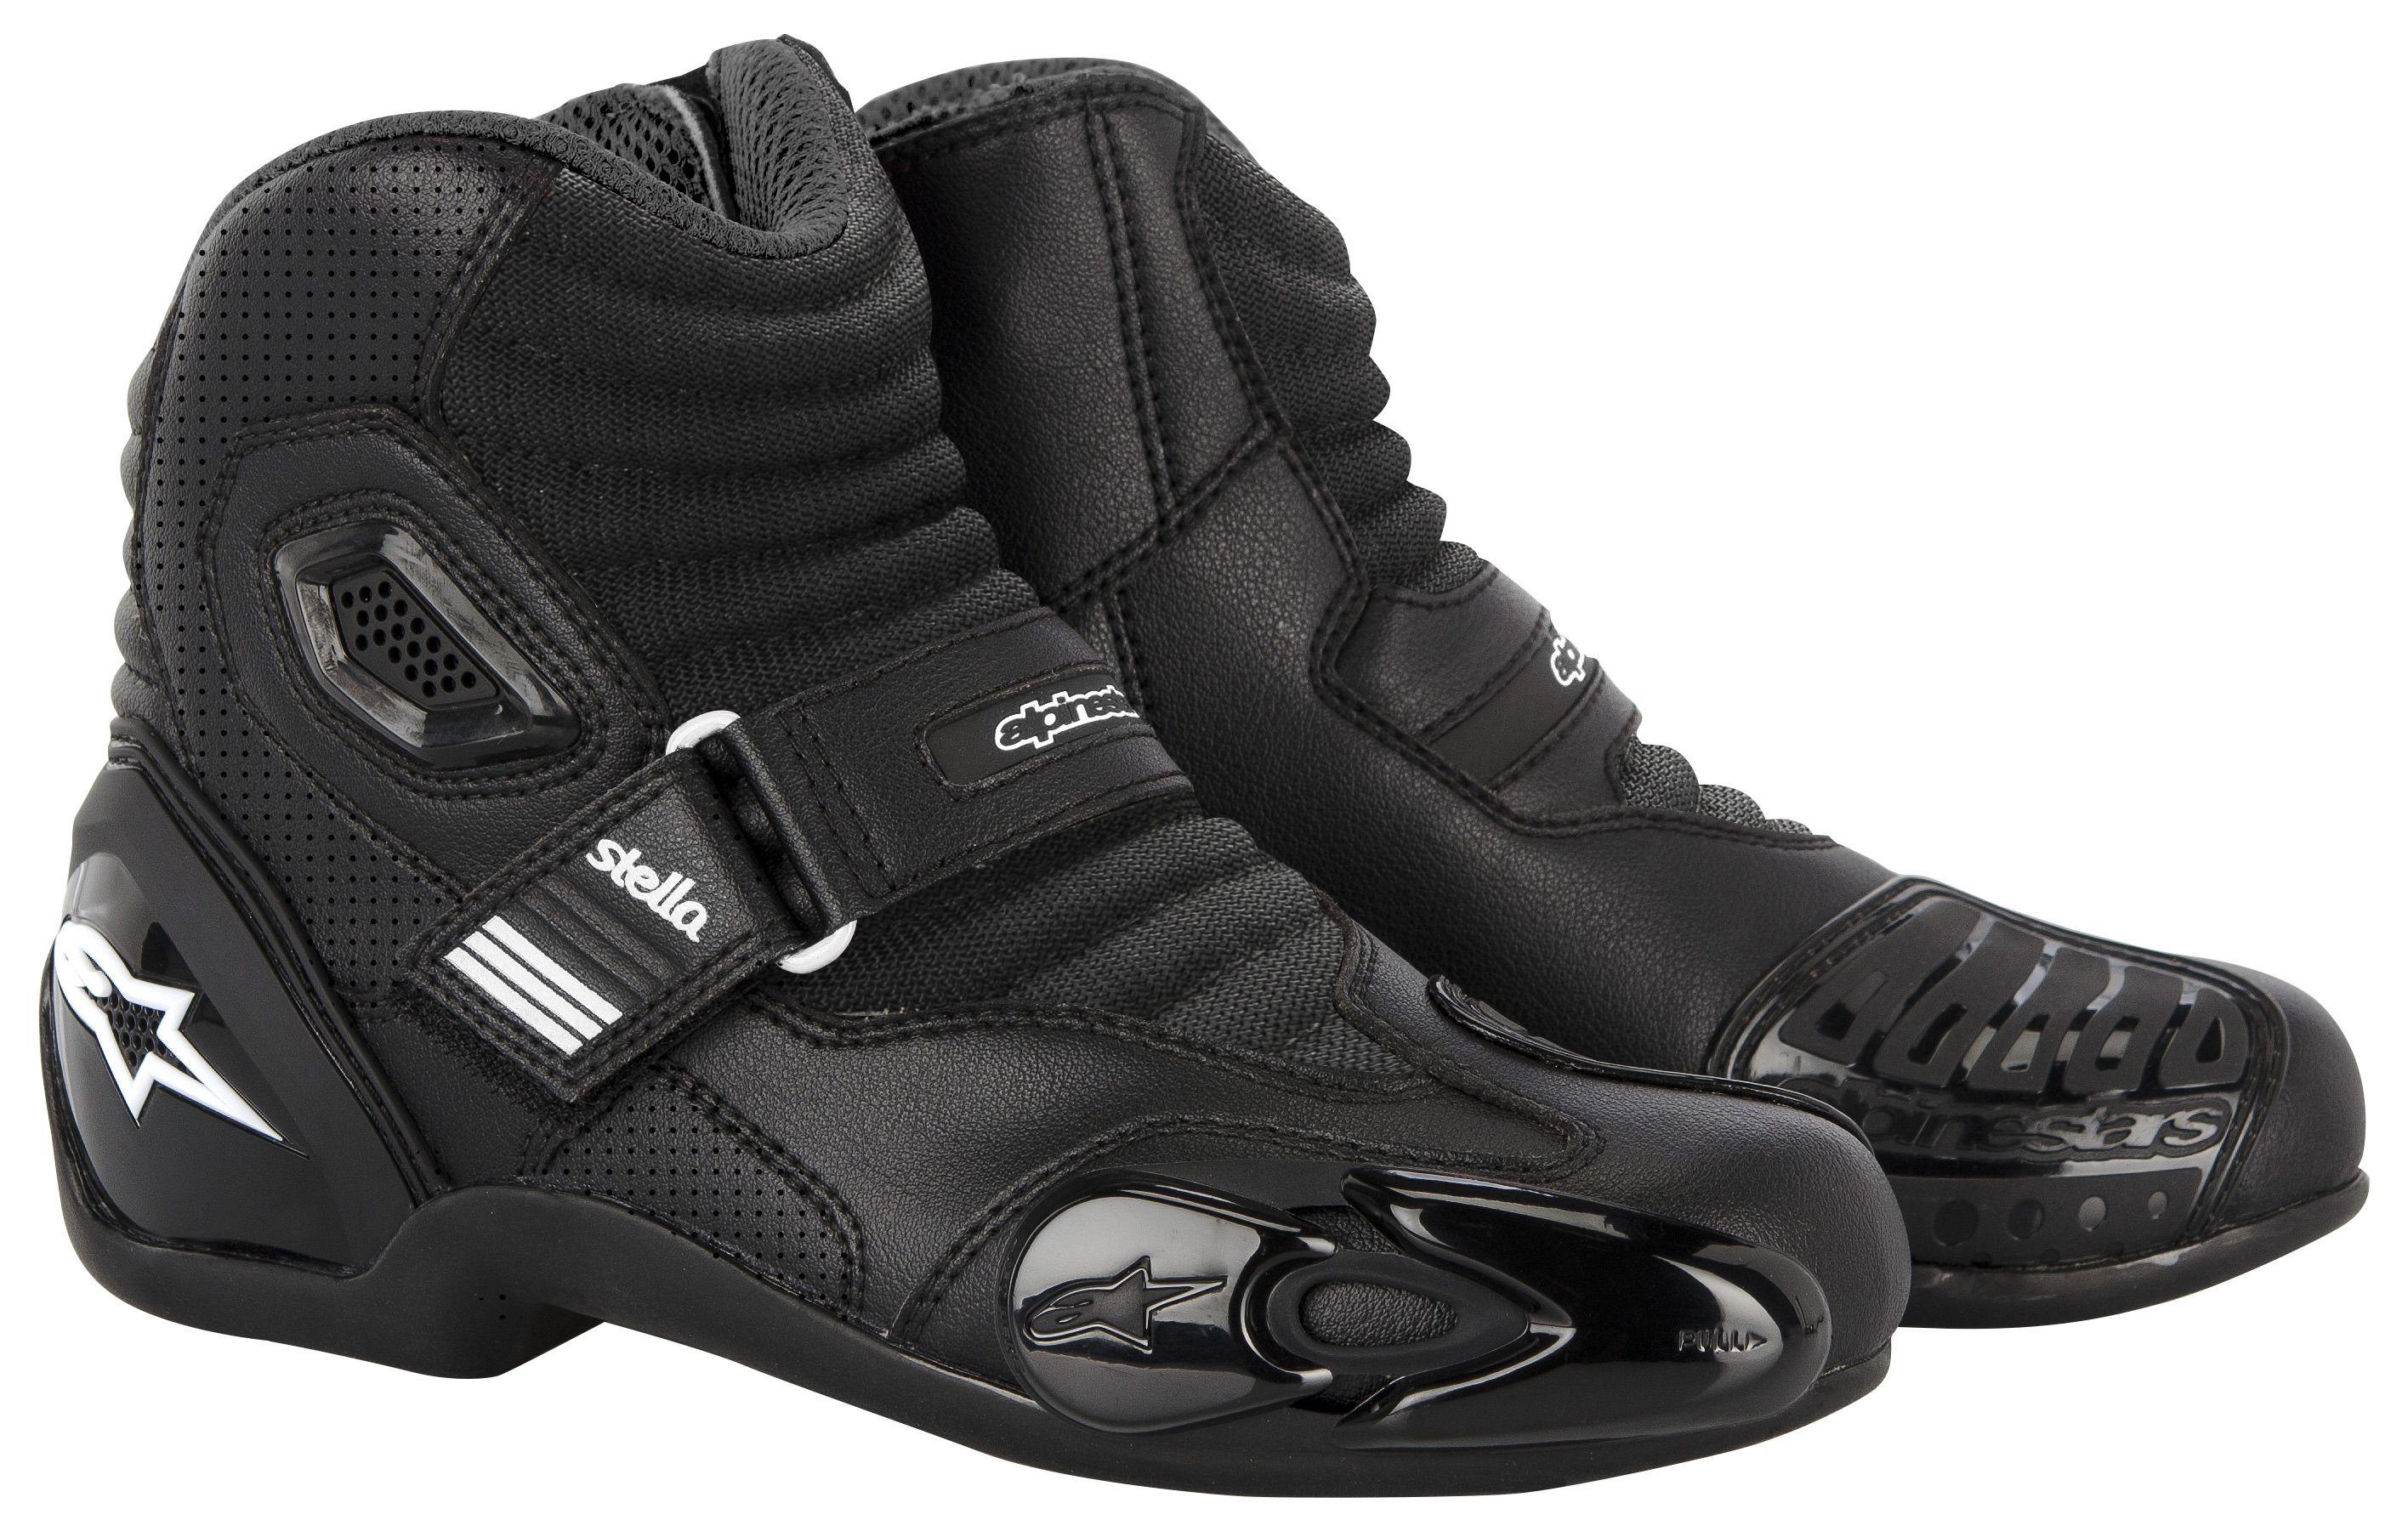 Alpinestars Stella Smx 1 Air Gloves Cycle Gear